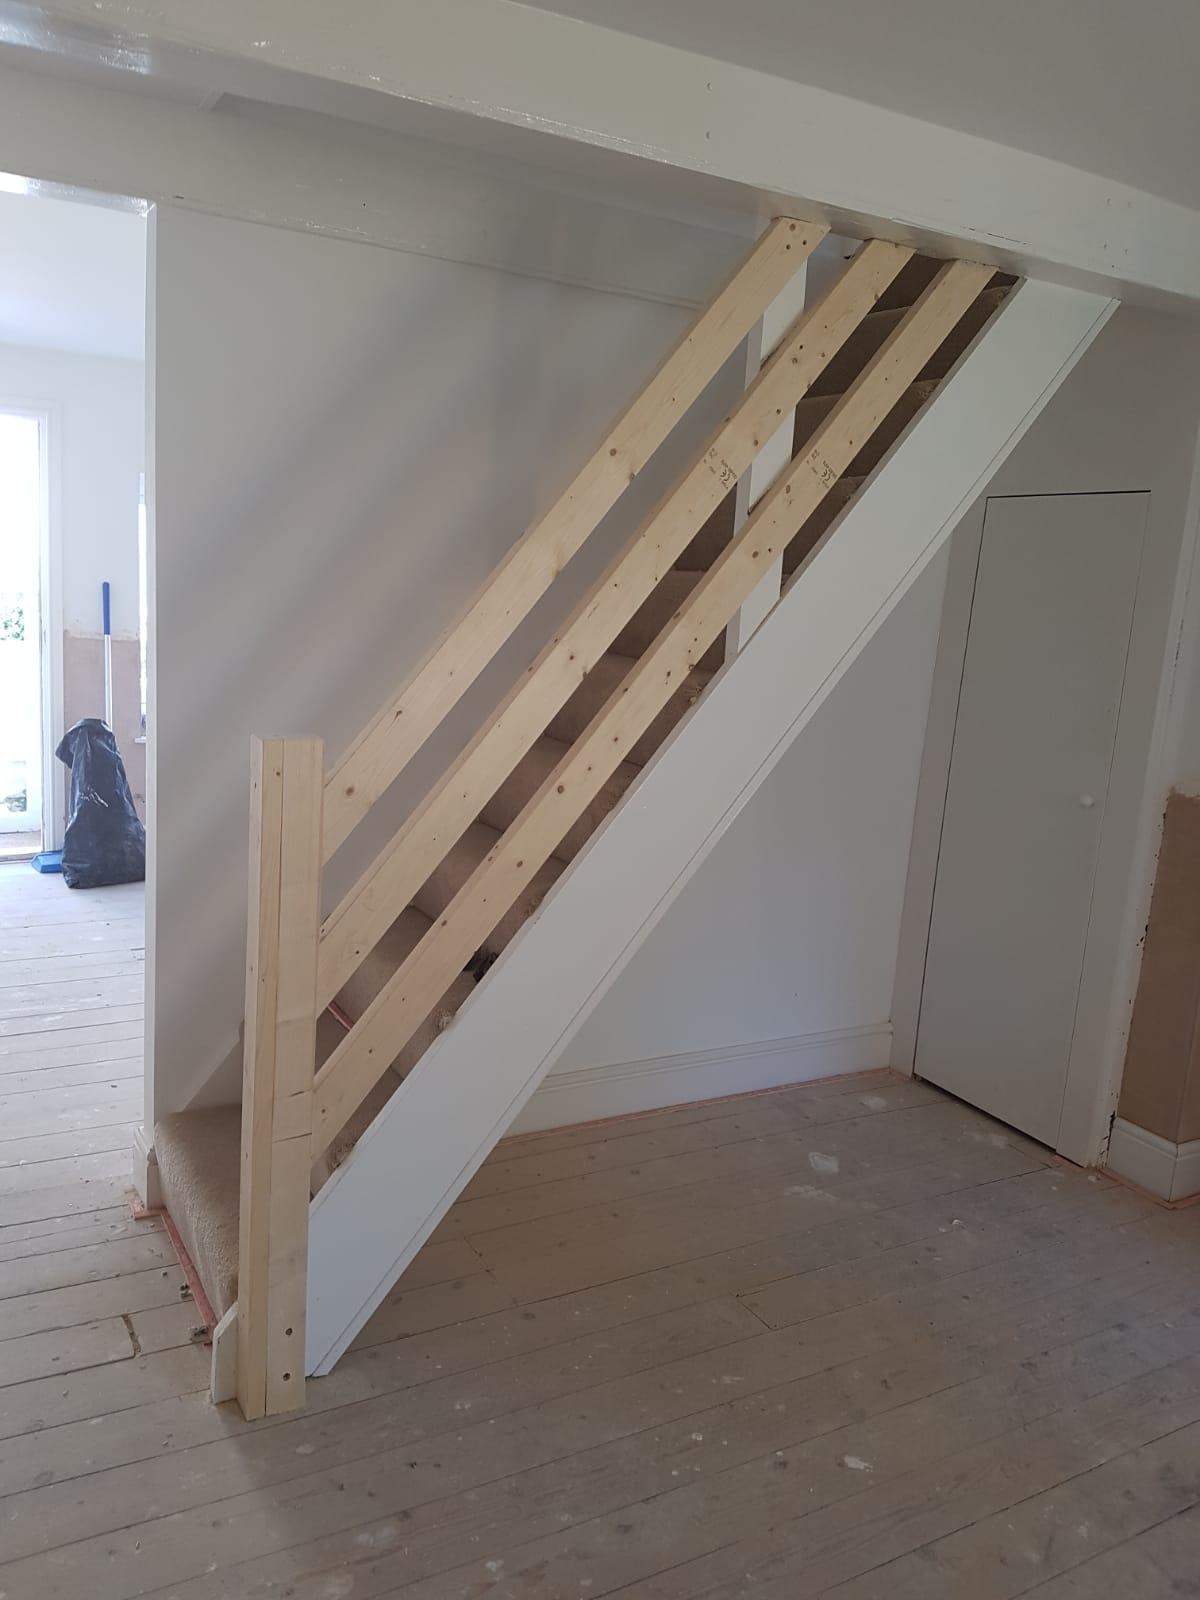 New banister Installation